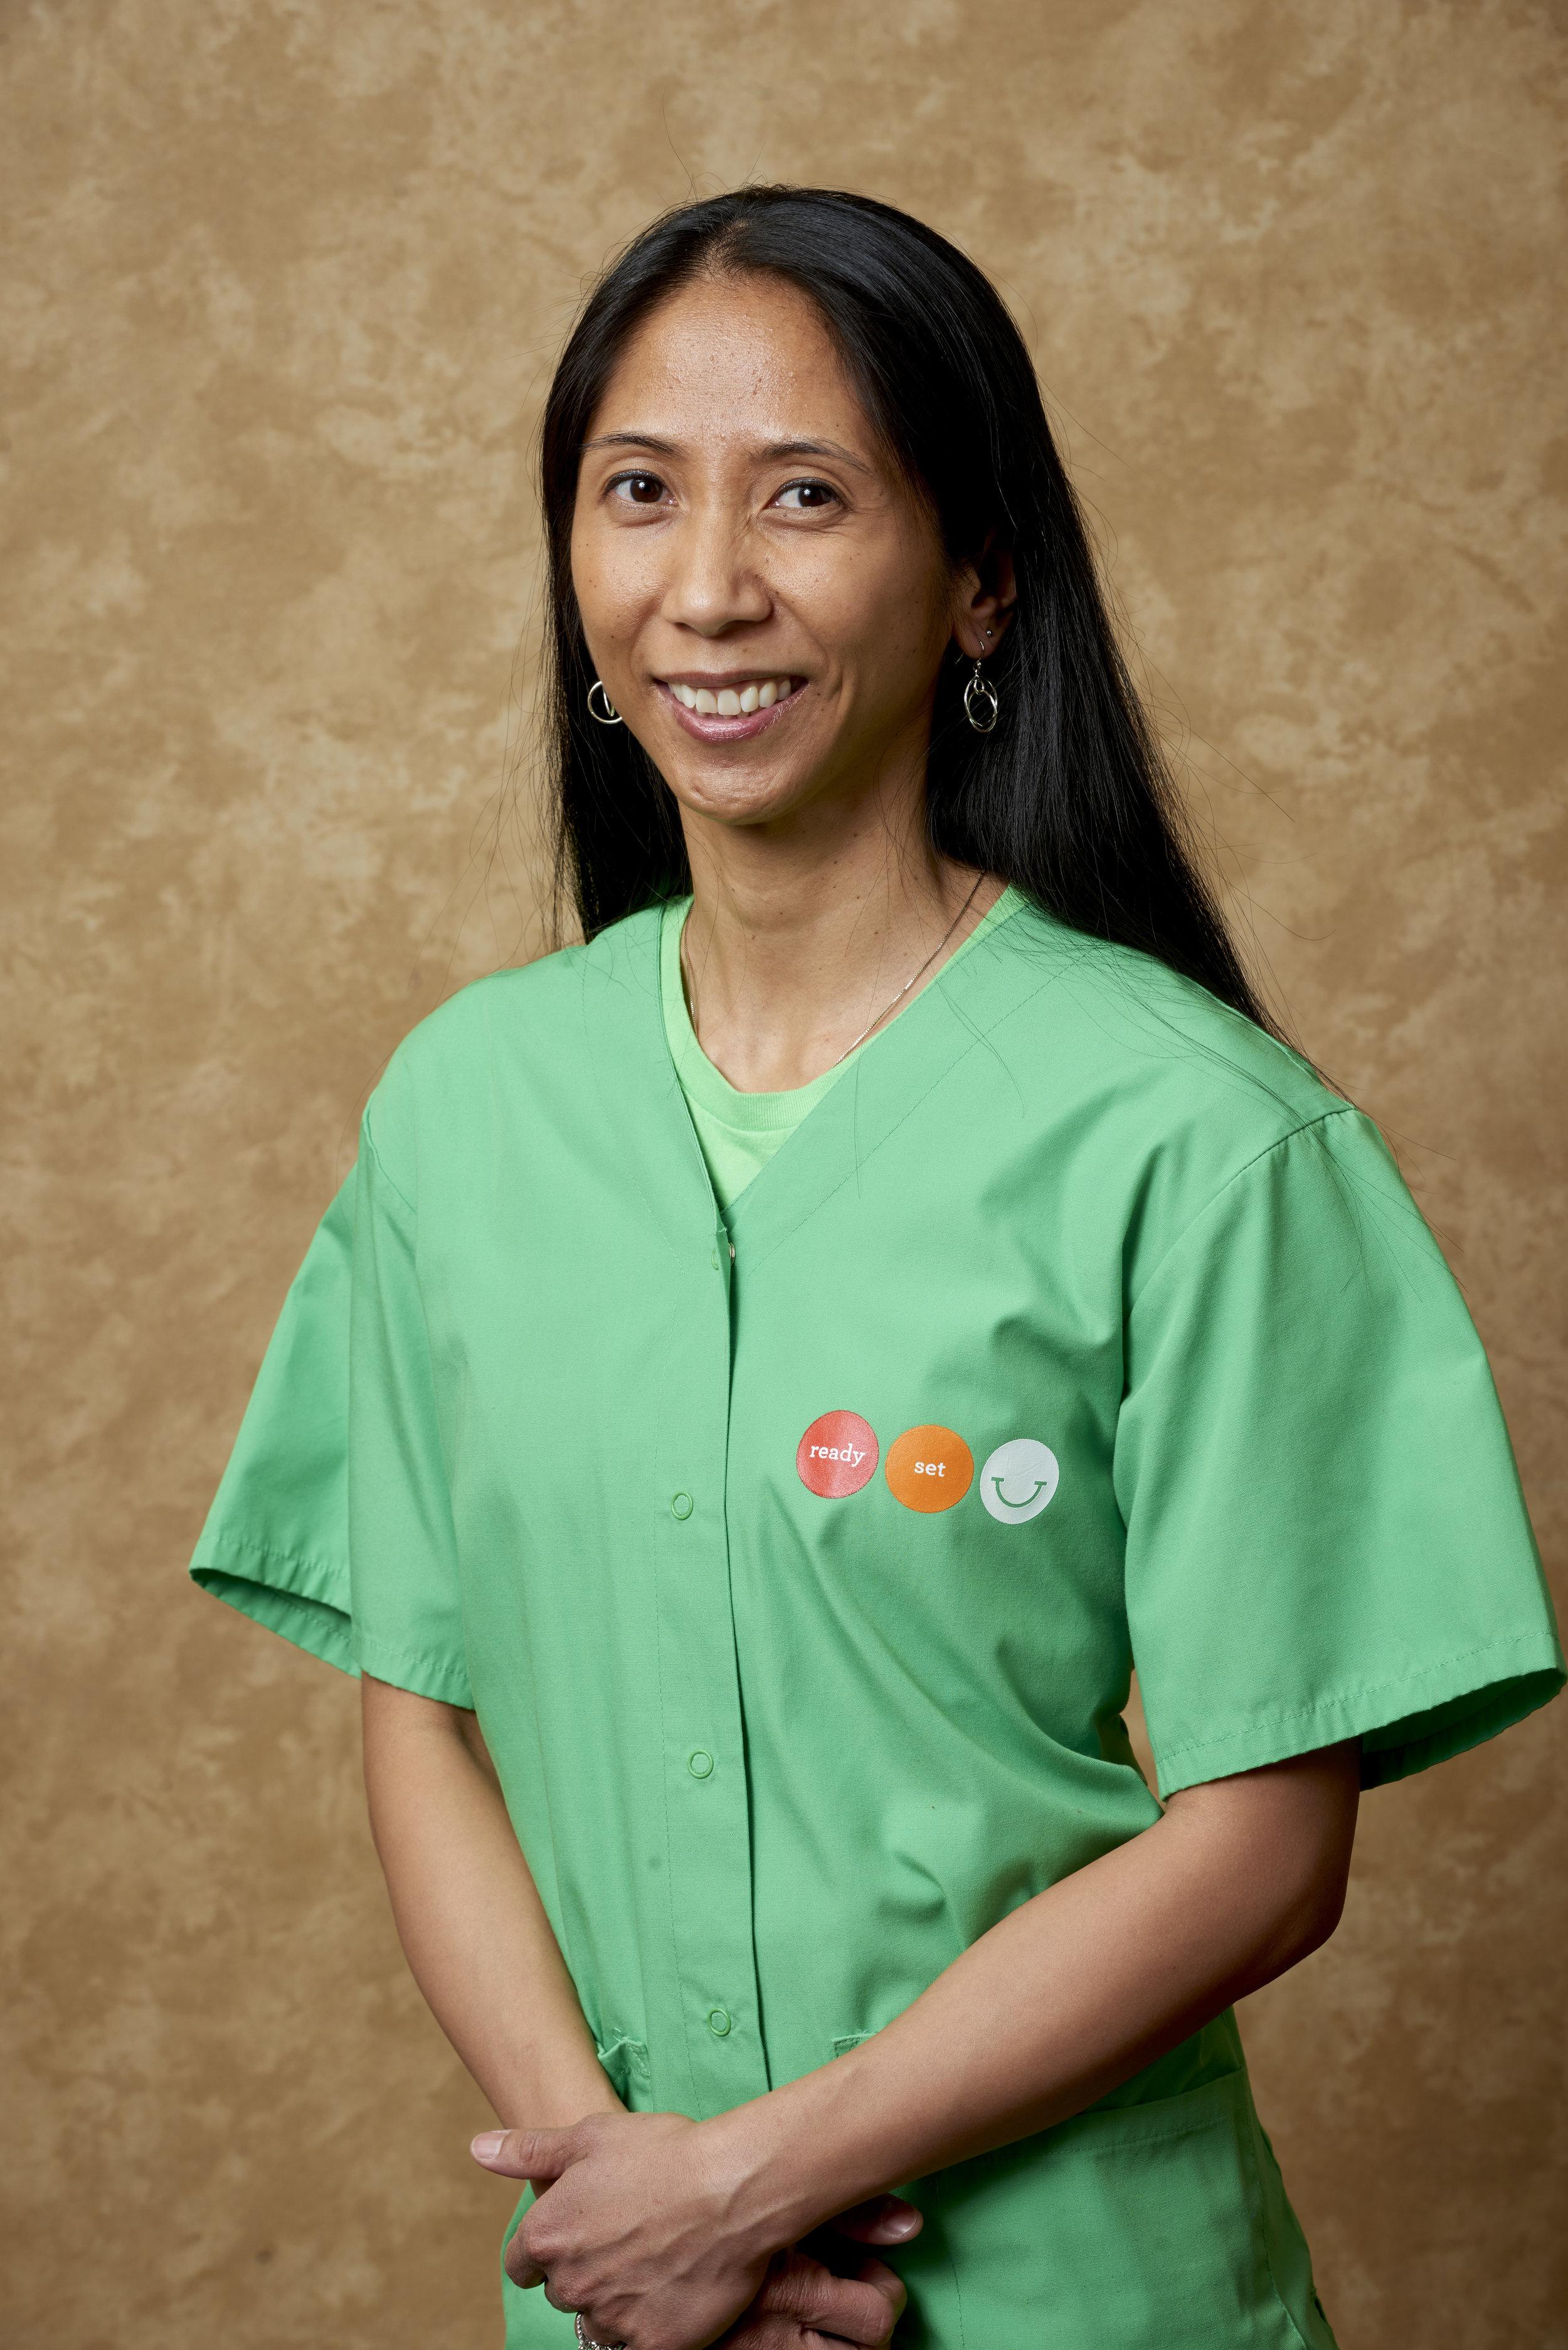 Advanced Dental Therapist, Verny M.